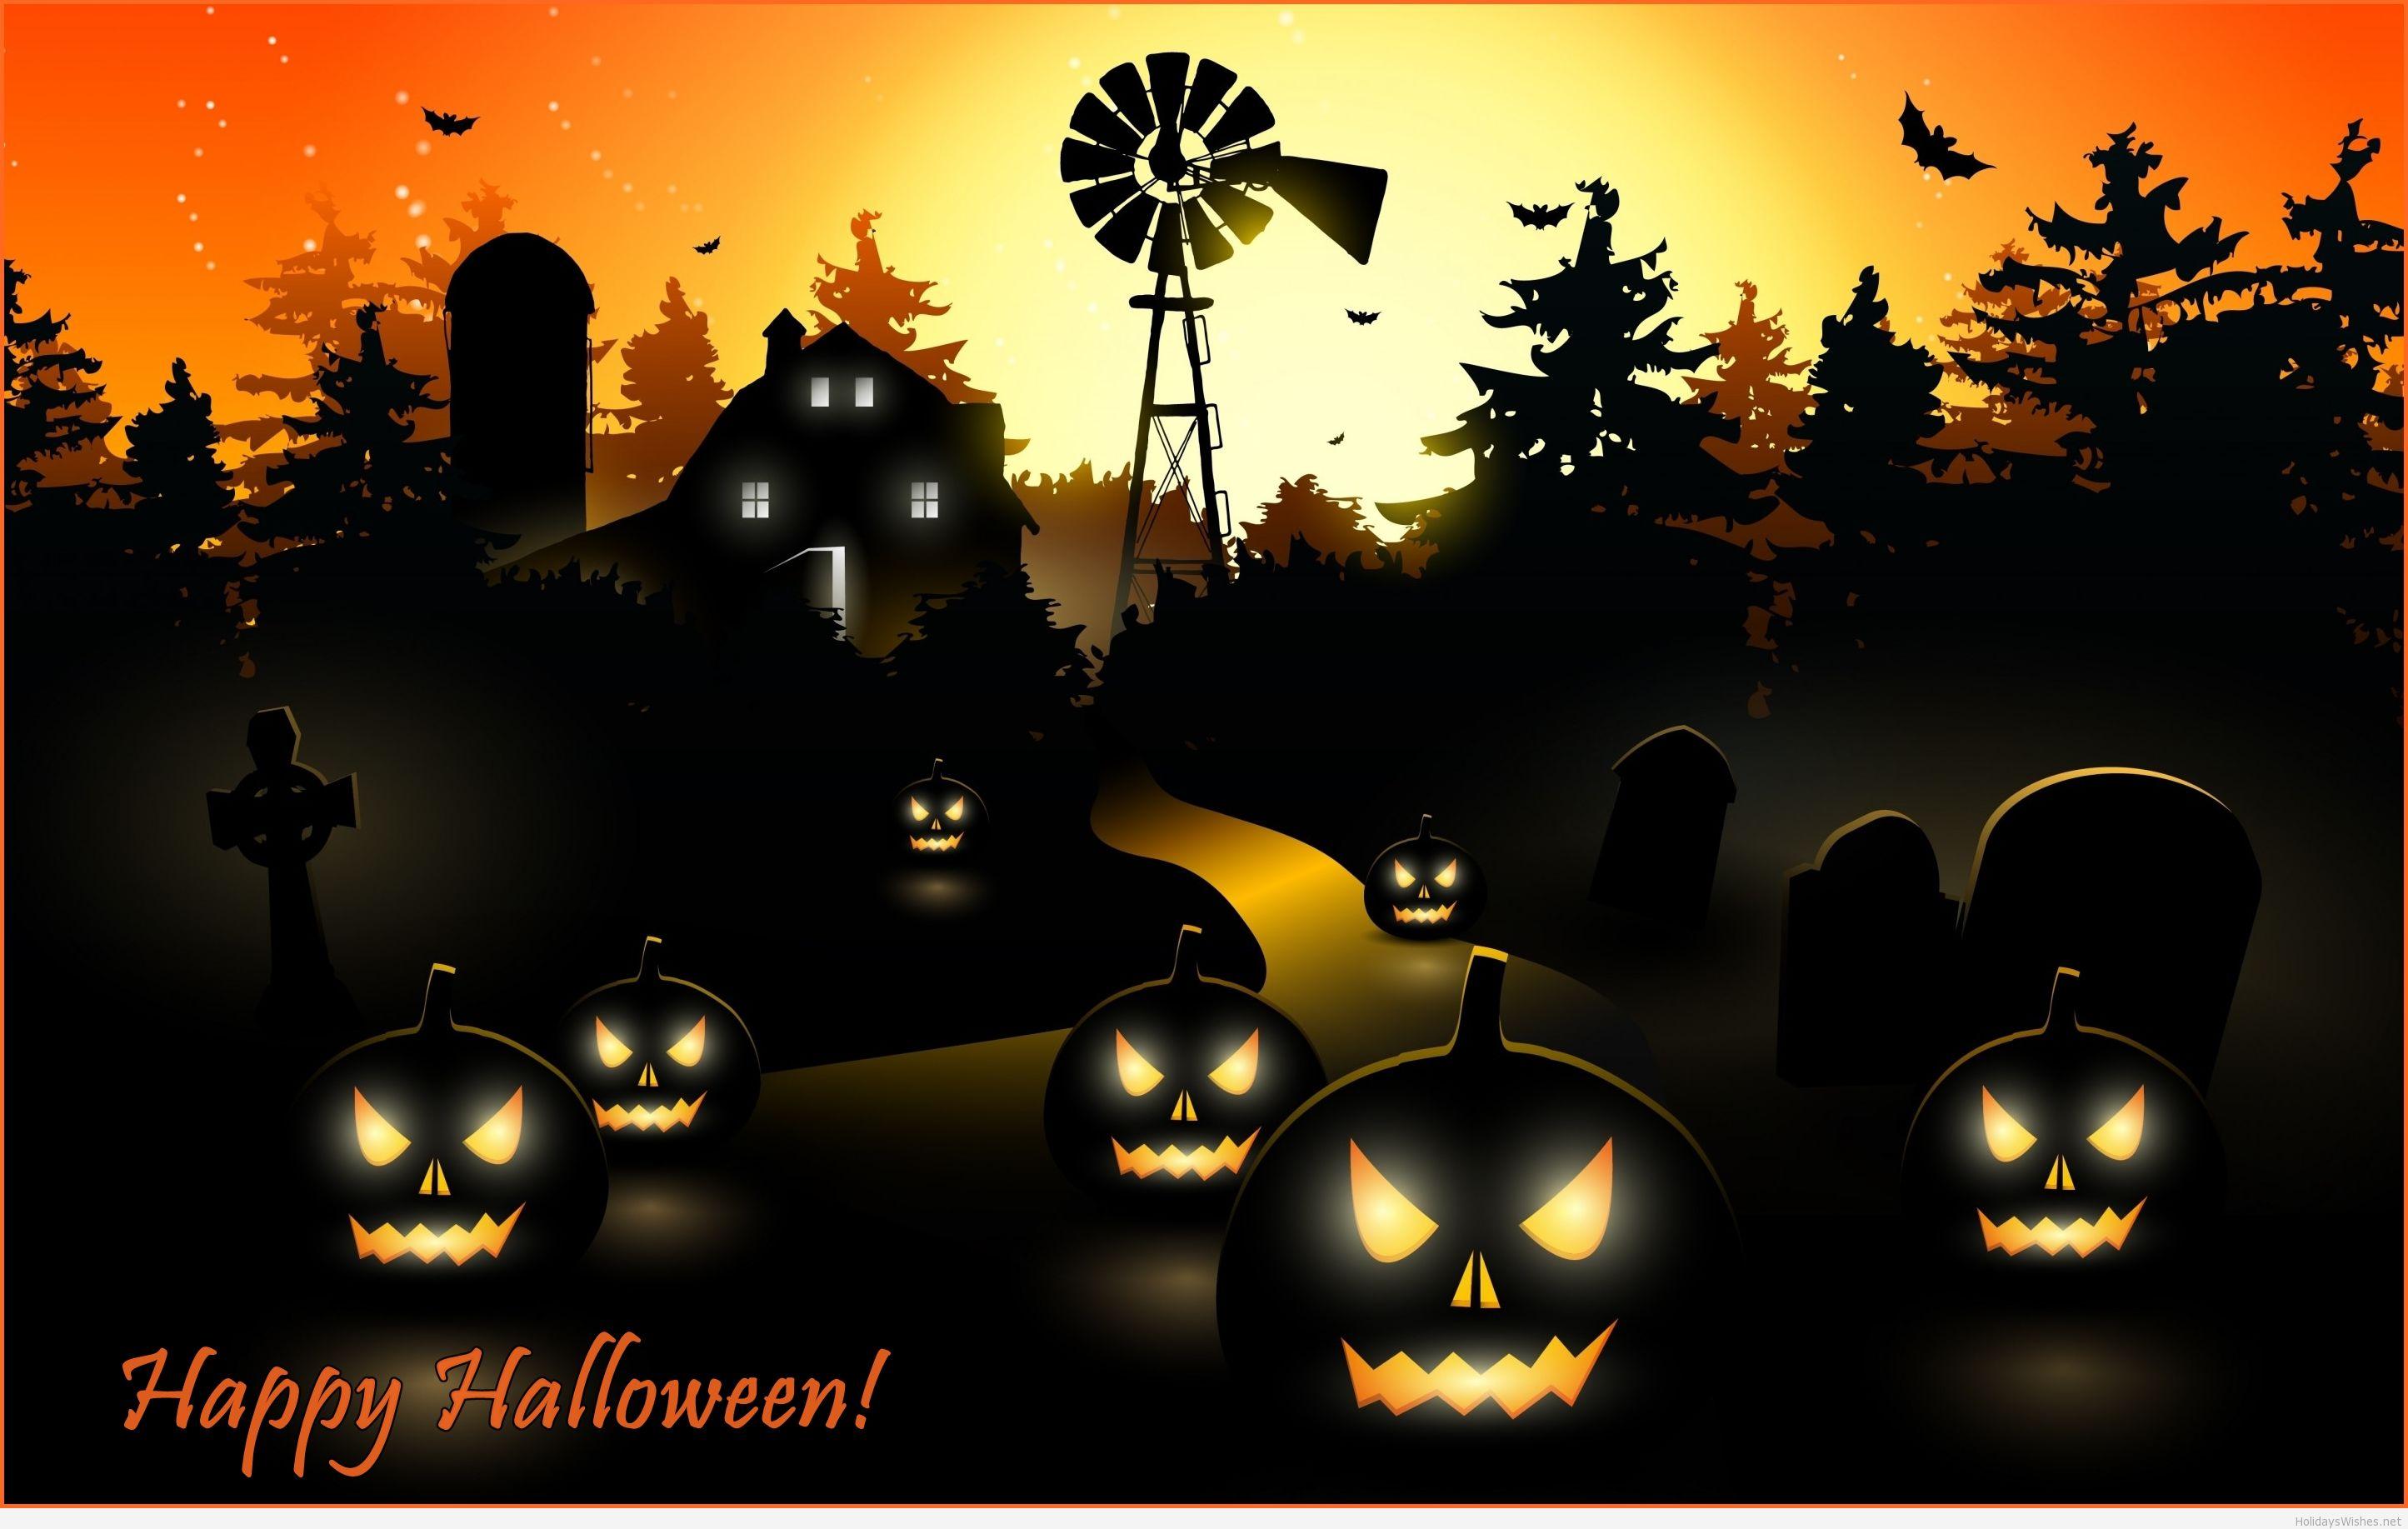 Happy-Halloween-scary-pumpkins-image